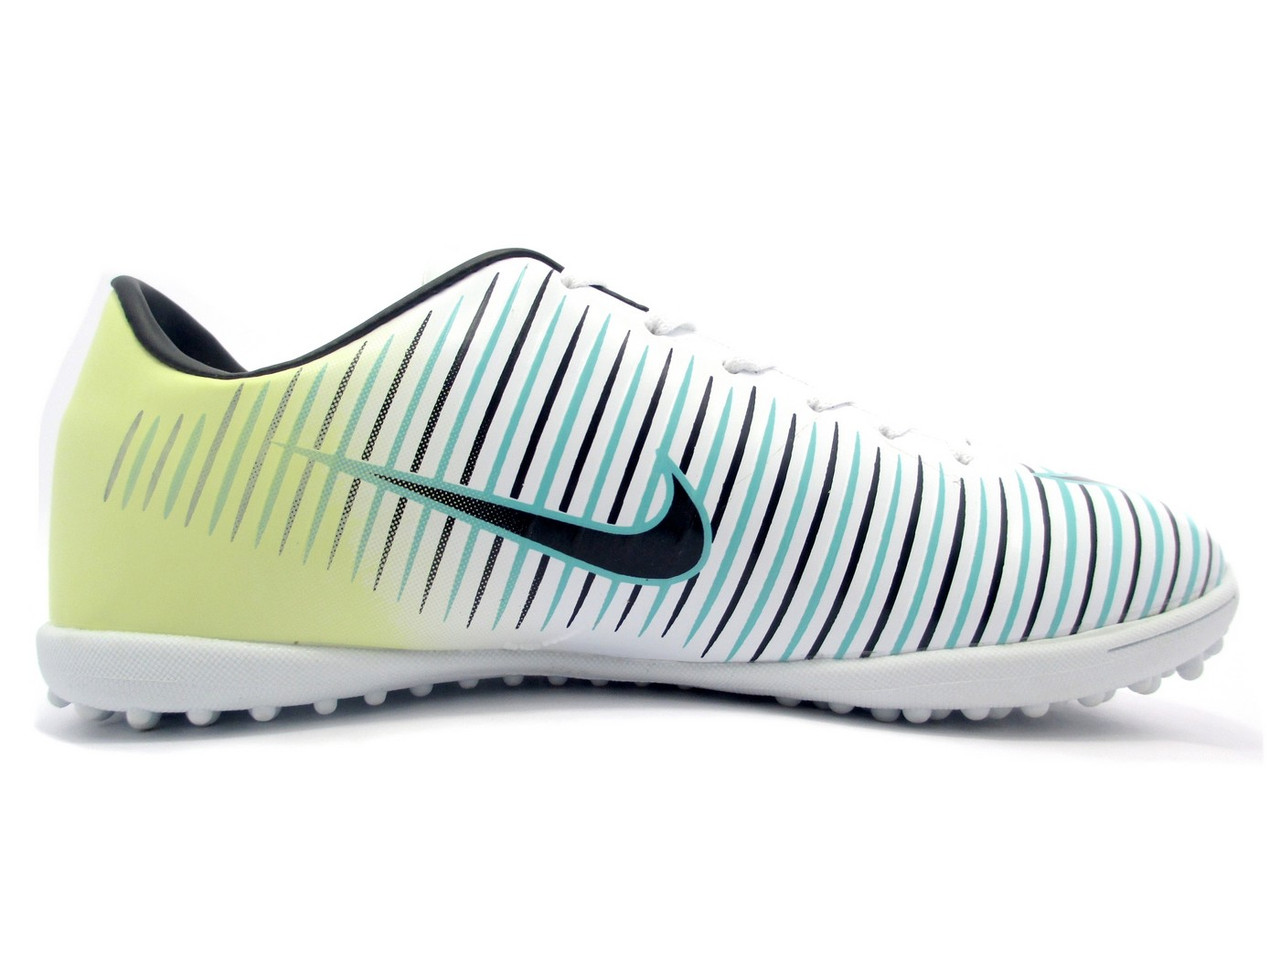 Футбольные сороконожки Nike Mercurial Victory TF White/Black/Volt/Jade Blue